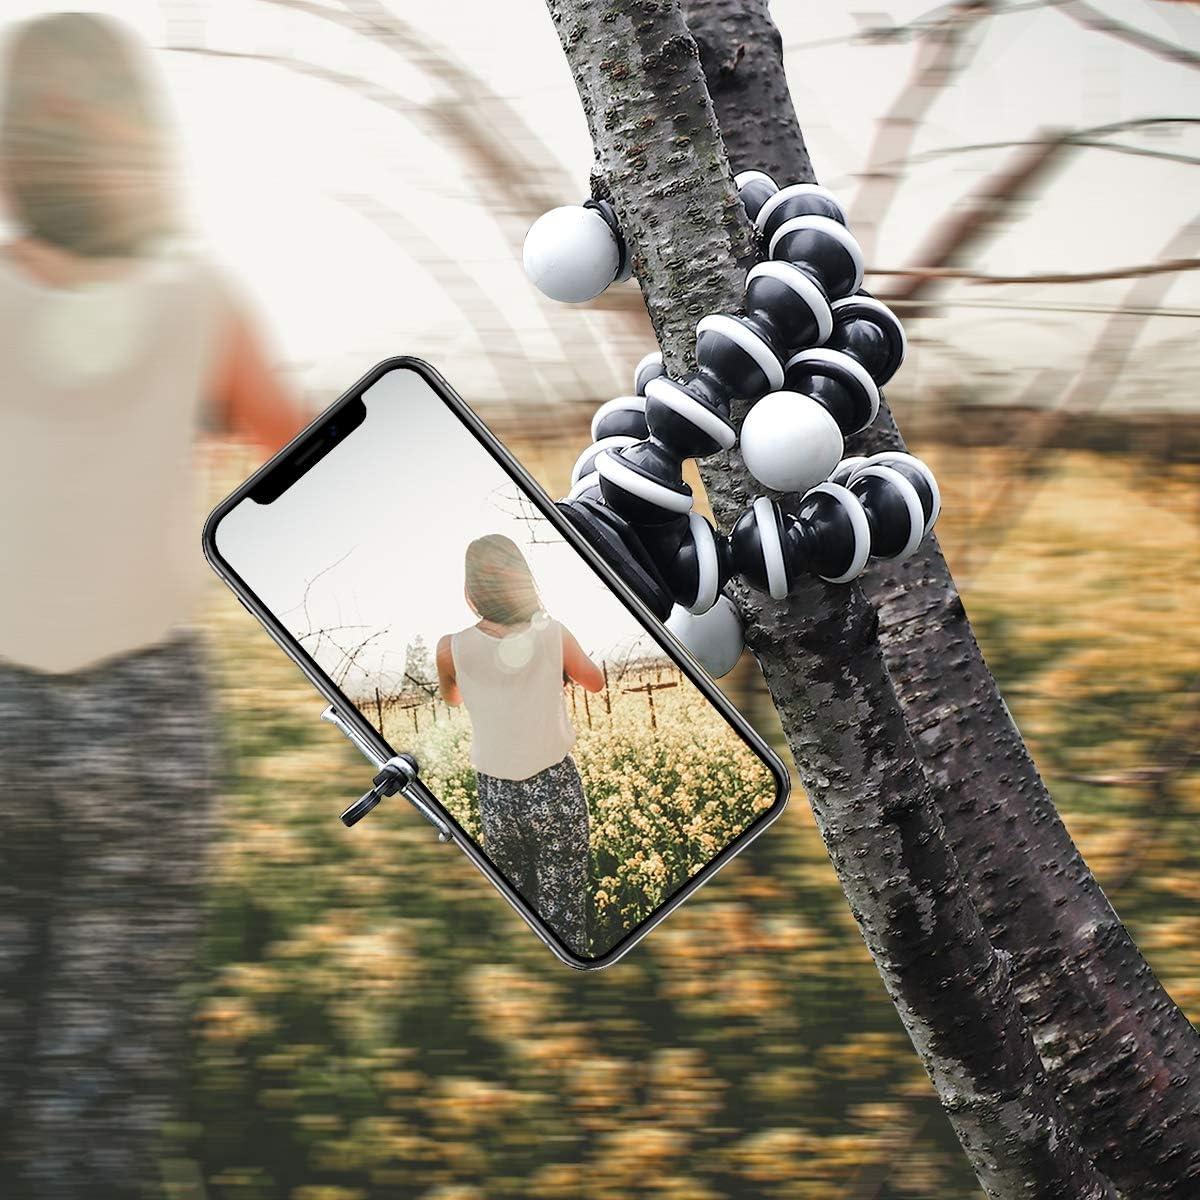 Portable and Adjustable Lightweight Phone Tripod Vech Phone Flexible Tripod Compact Tripod Stand 360/° and Universal Phone Tripod with Android Phone